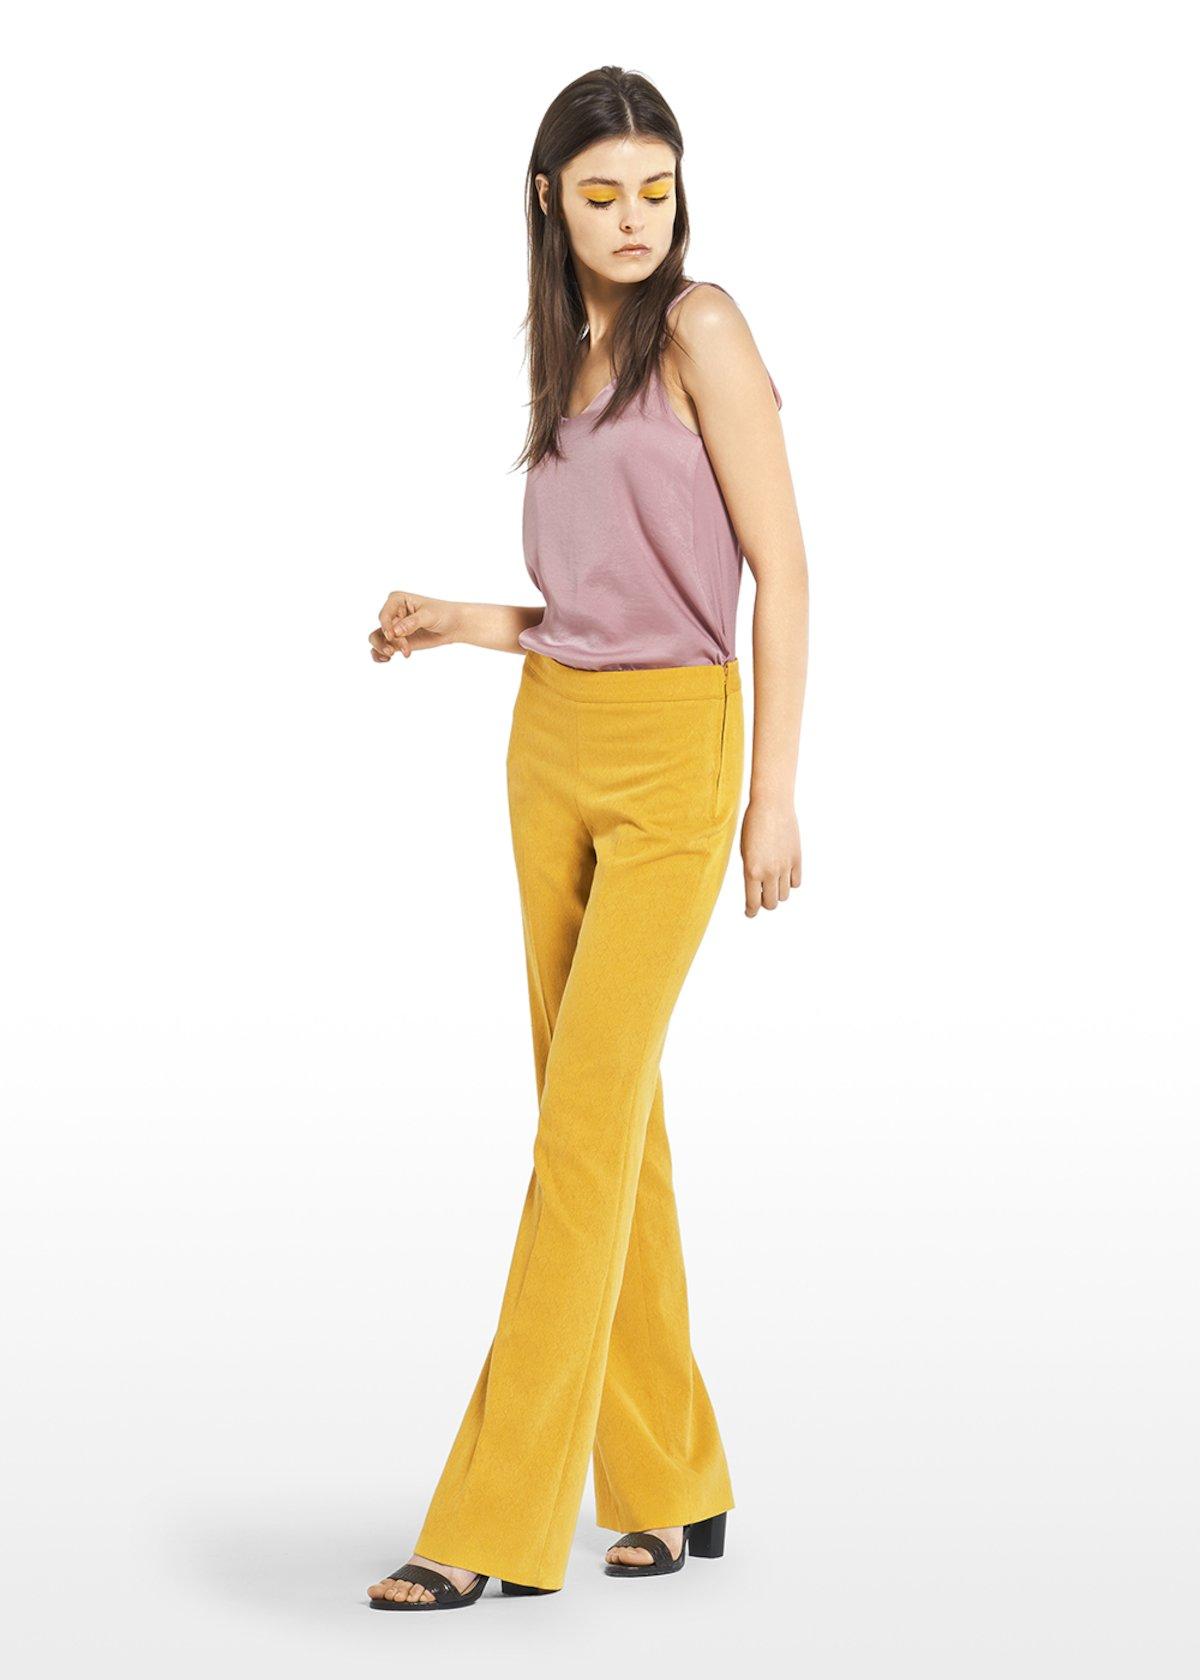 Pico trousers Victoria model jacquard fabric - Brown - Woman